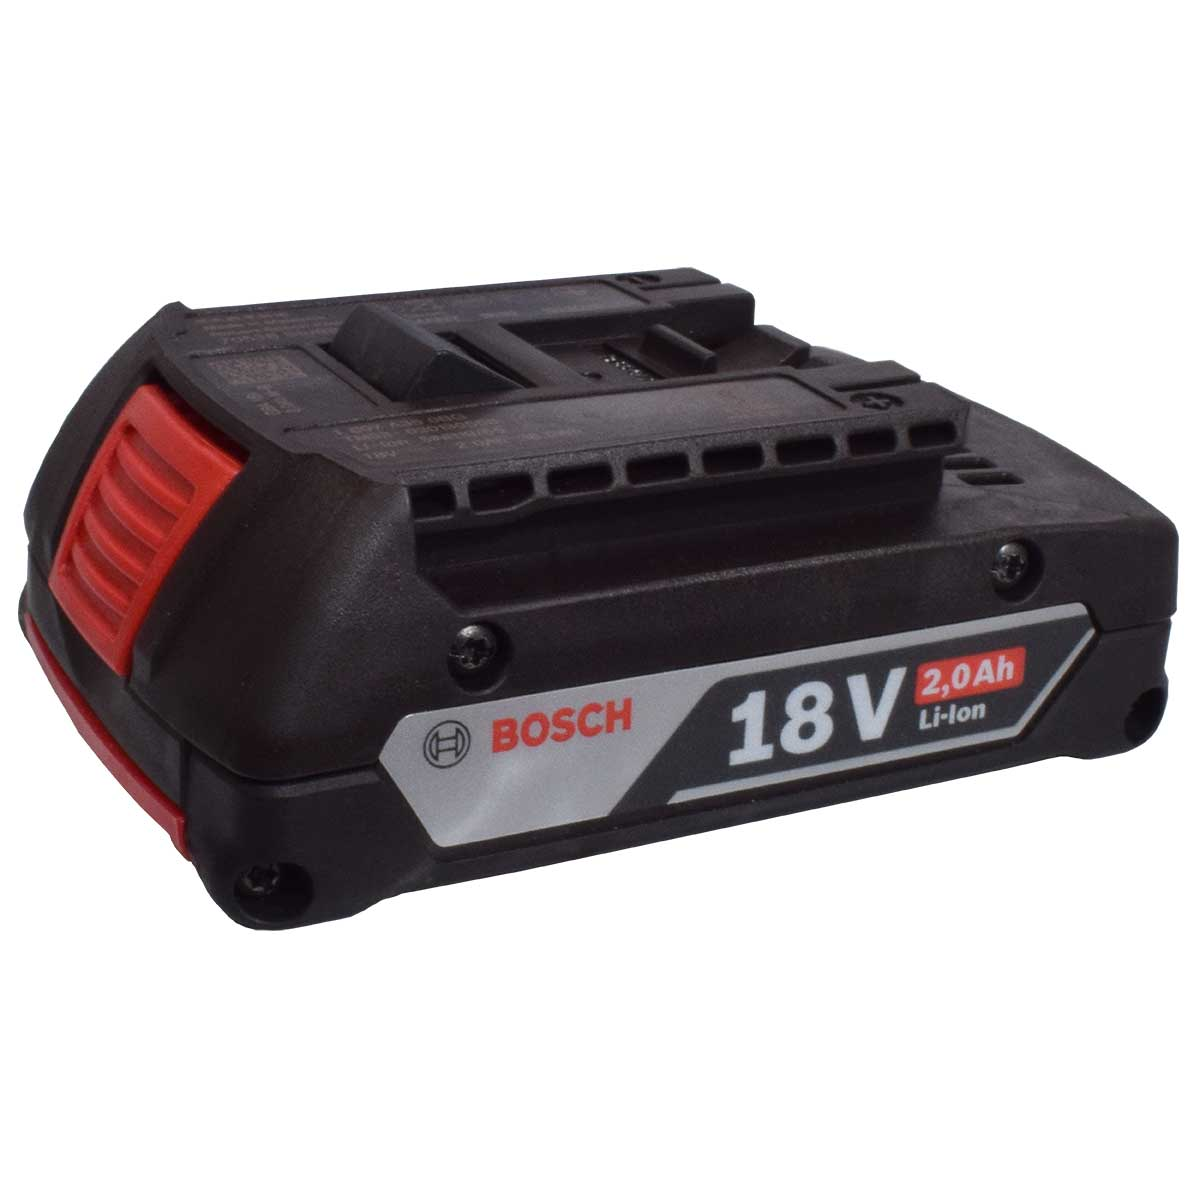 Bateria De 18v Li-ion 2.0ah Bosch GBA 18v